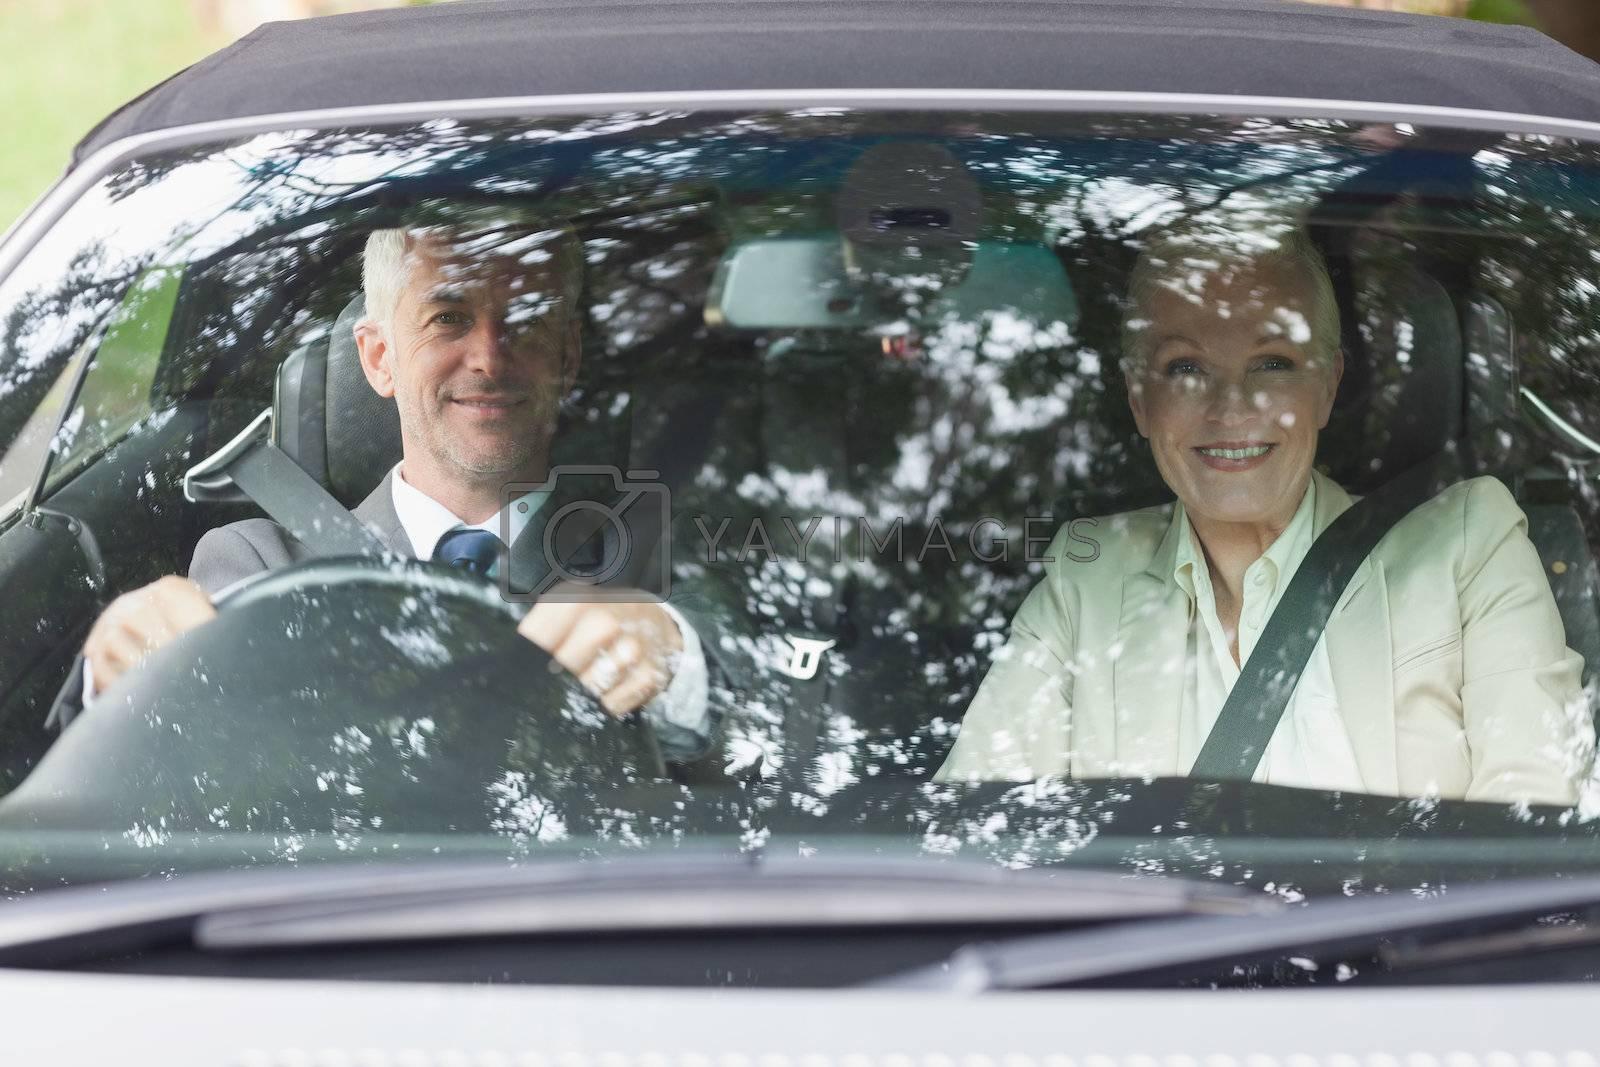 Business people having a ride in classy car by Wavebreakmedia